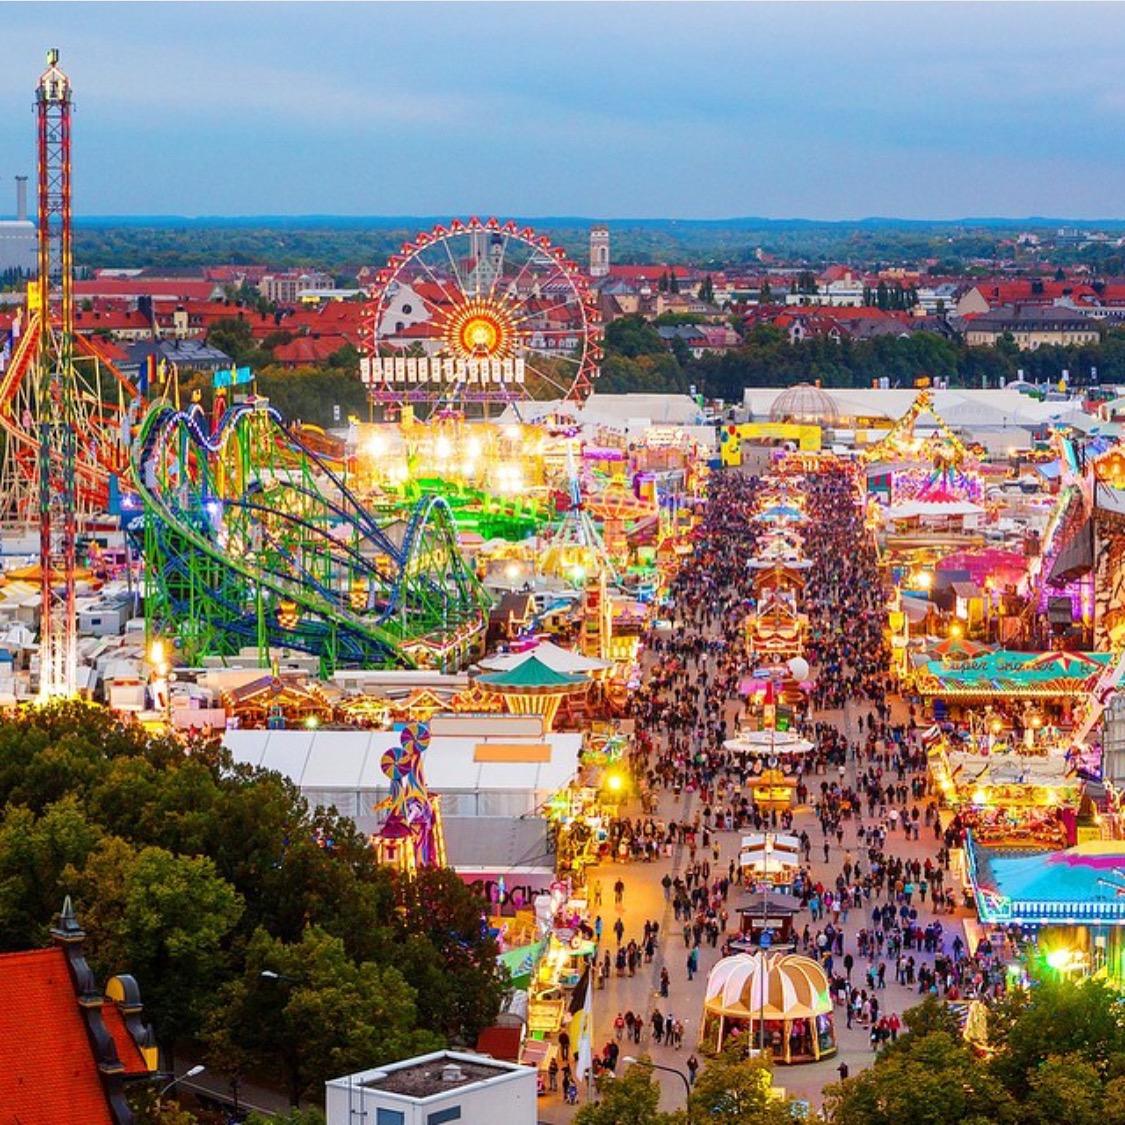 Oktoberfest Lunapark